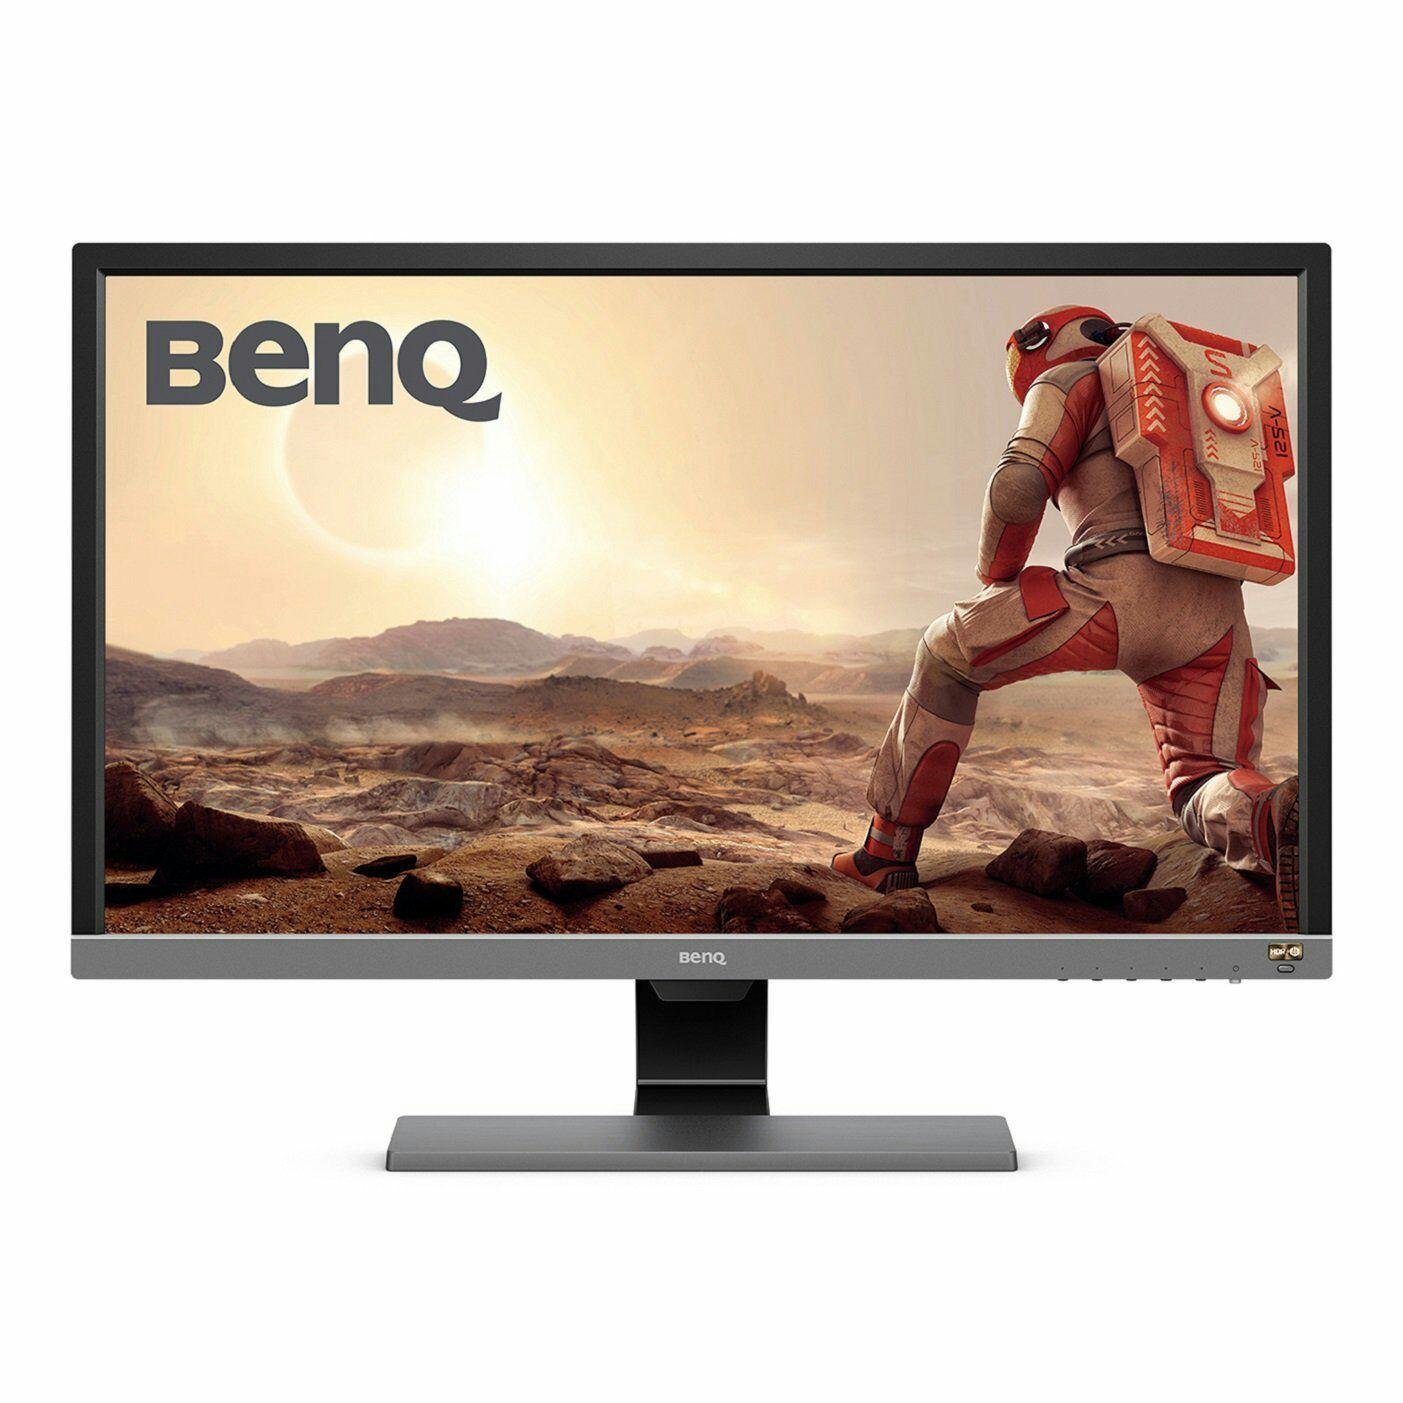 "Monitor 28"" BenQ EL2870U - 4K UHD, FreeSync, 1ms, HDR 10, Eye-Care, DisplayPort (Amazon.es)"